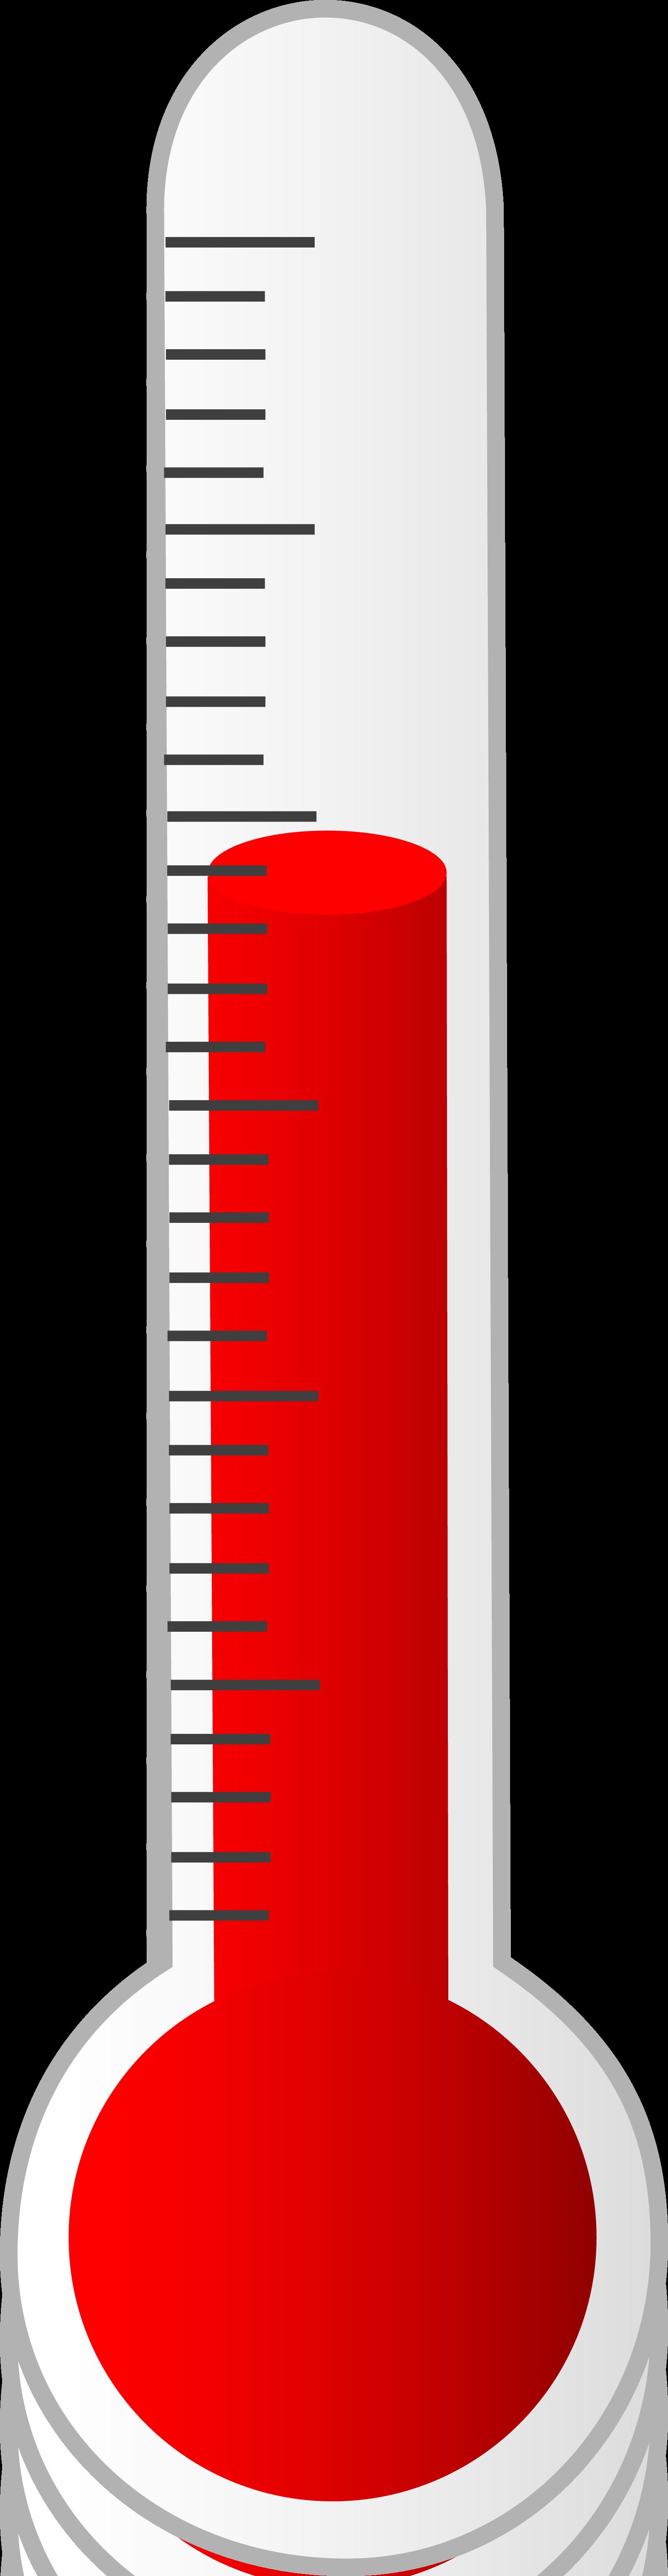 Thermometer Clip Art-Thermometer Clip Art-3